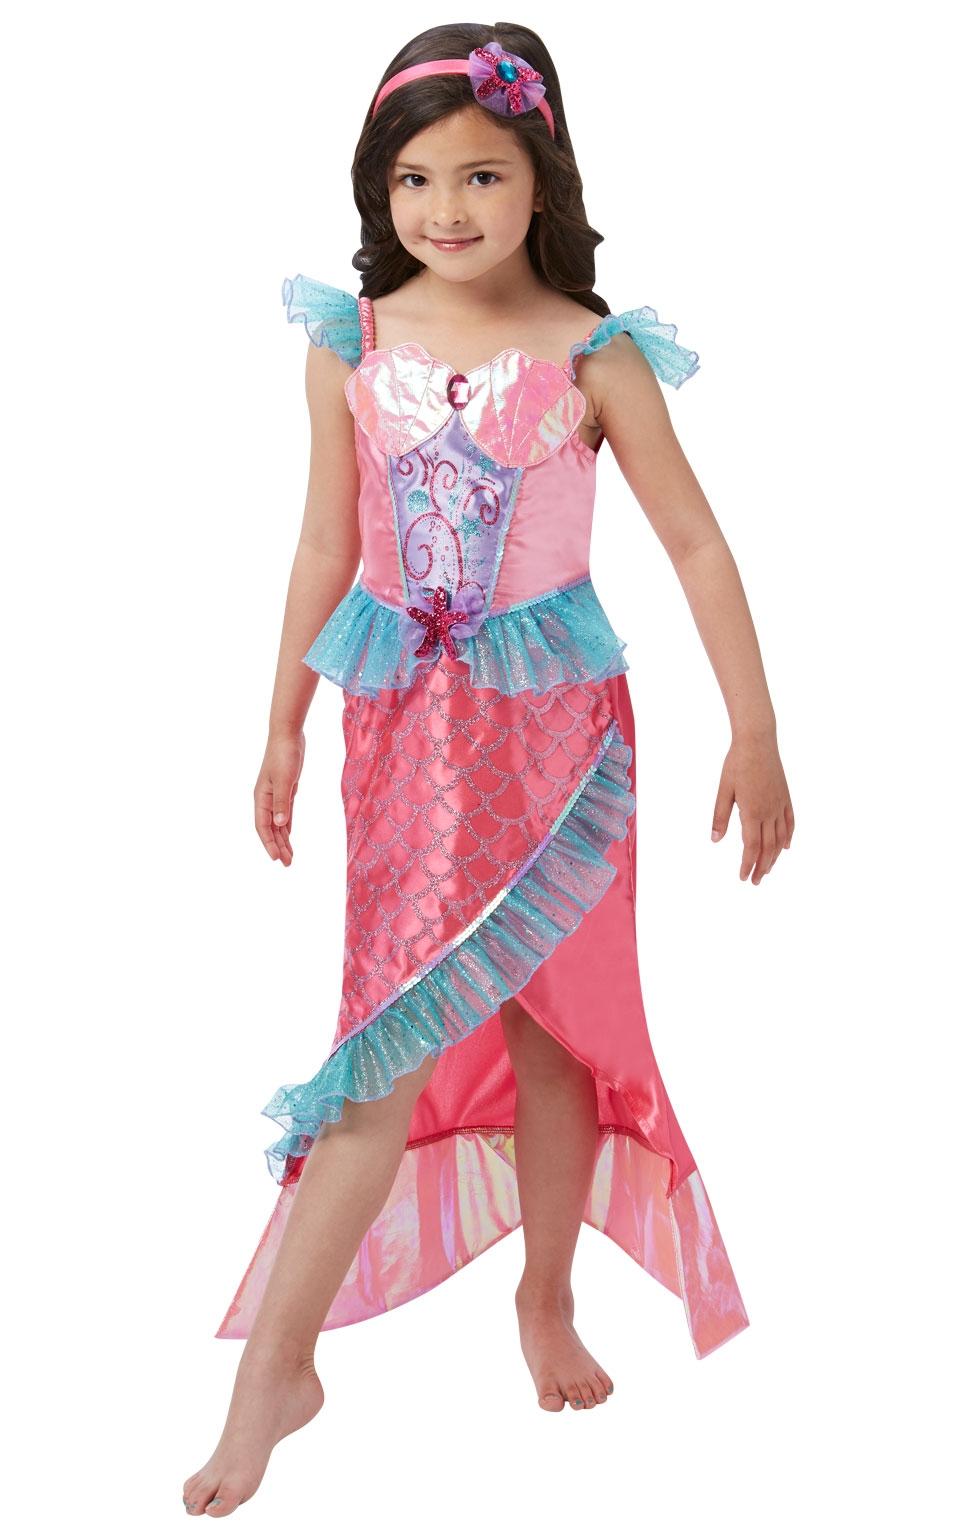 Костюм Русалочки розовый (26-28) детский костюм озорного клоуна 34